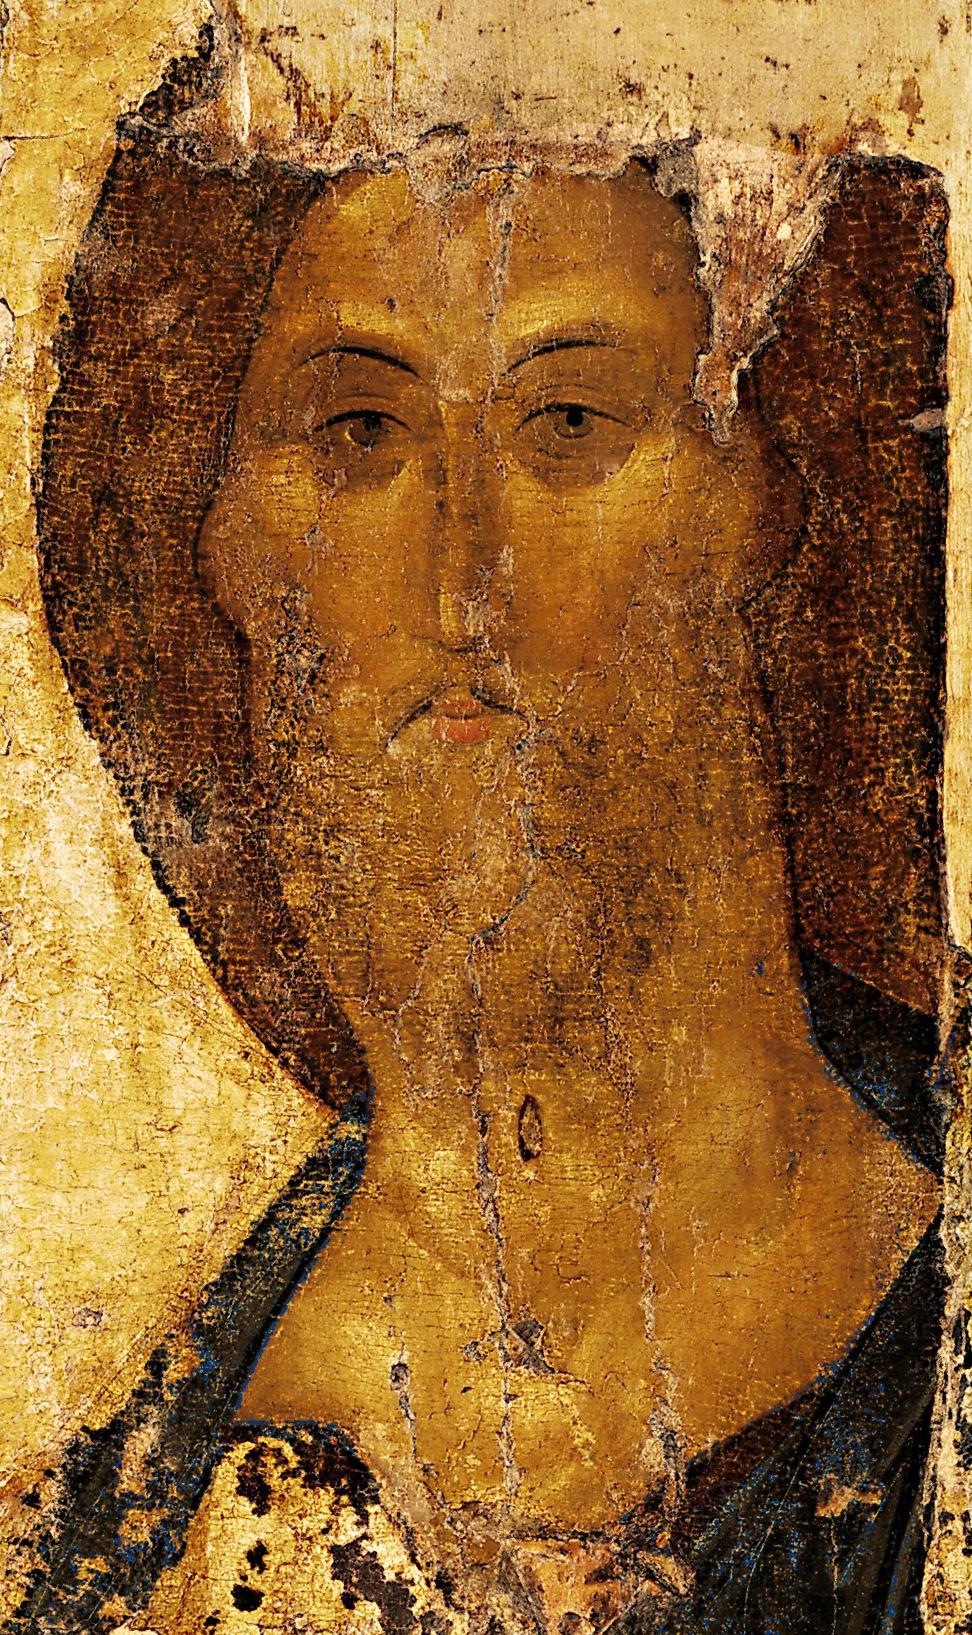 Kristus Išganytojas. Andrei Rublev, c. 1410 (2)